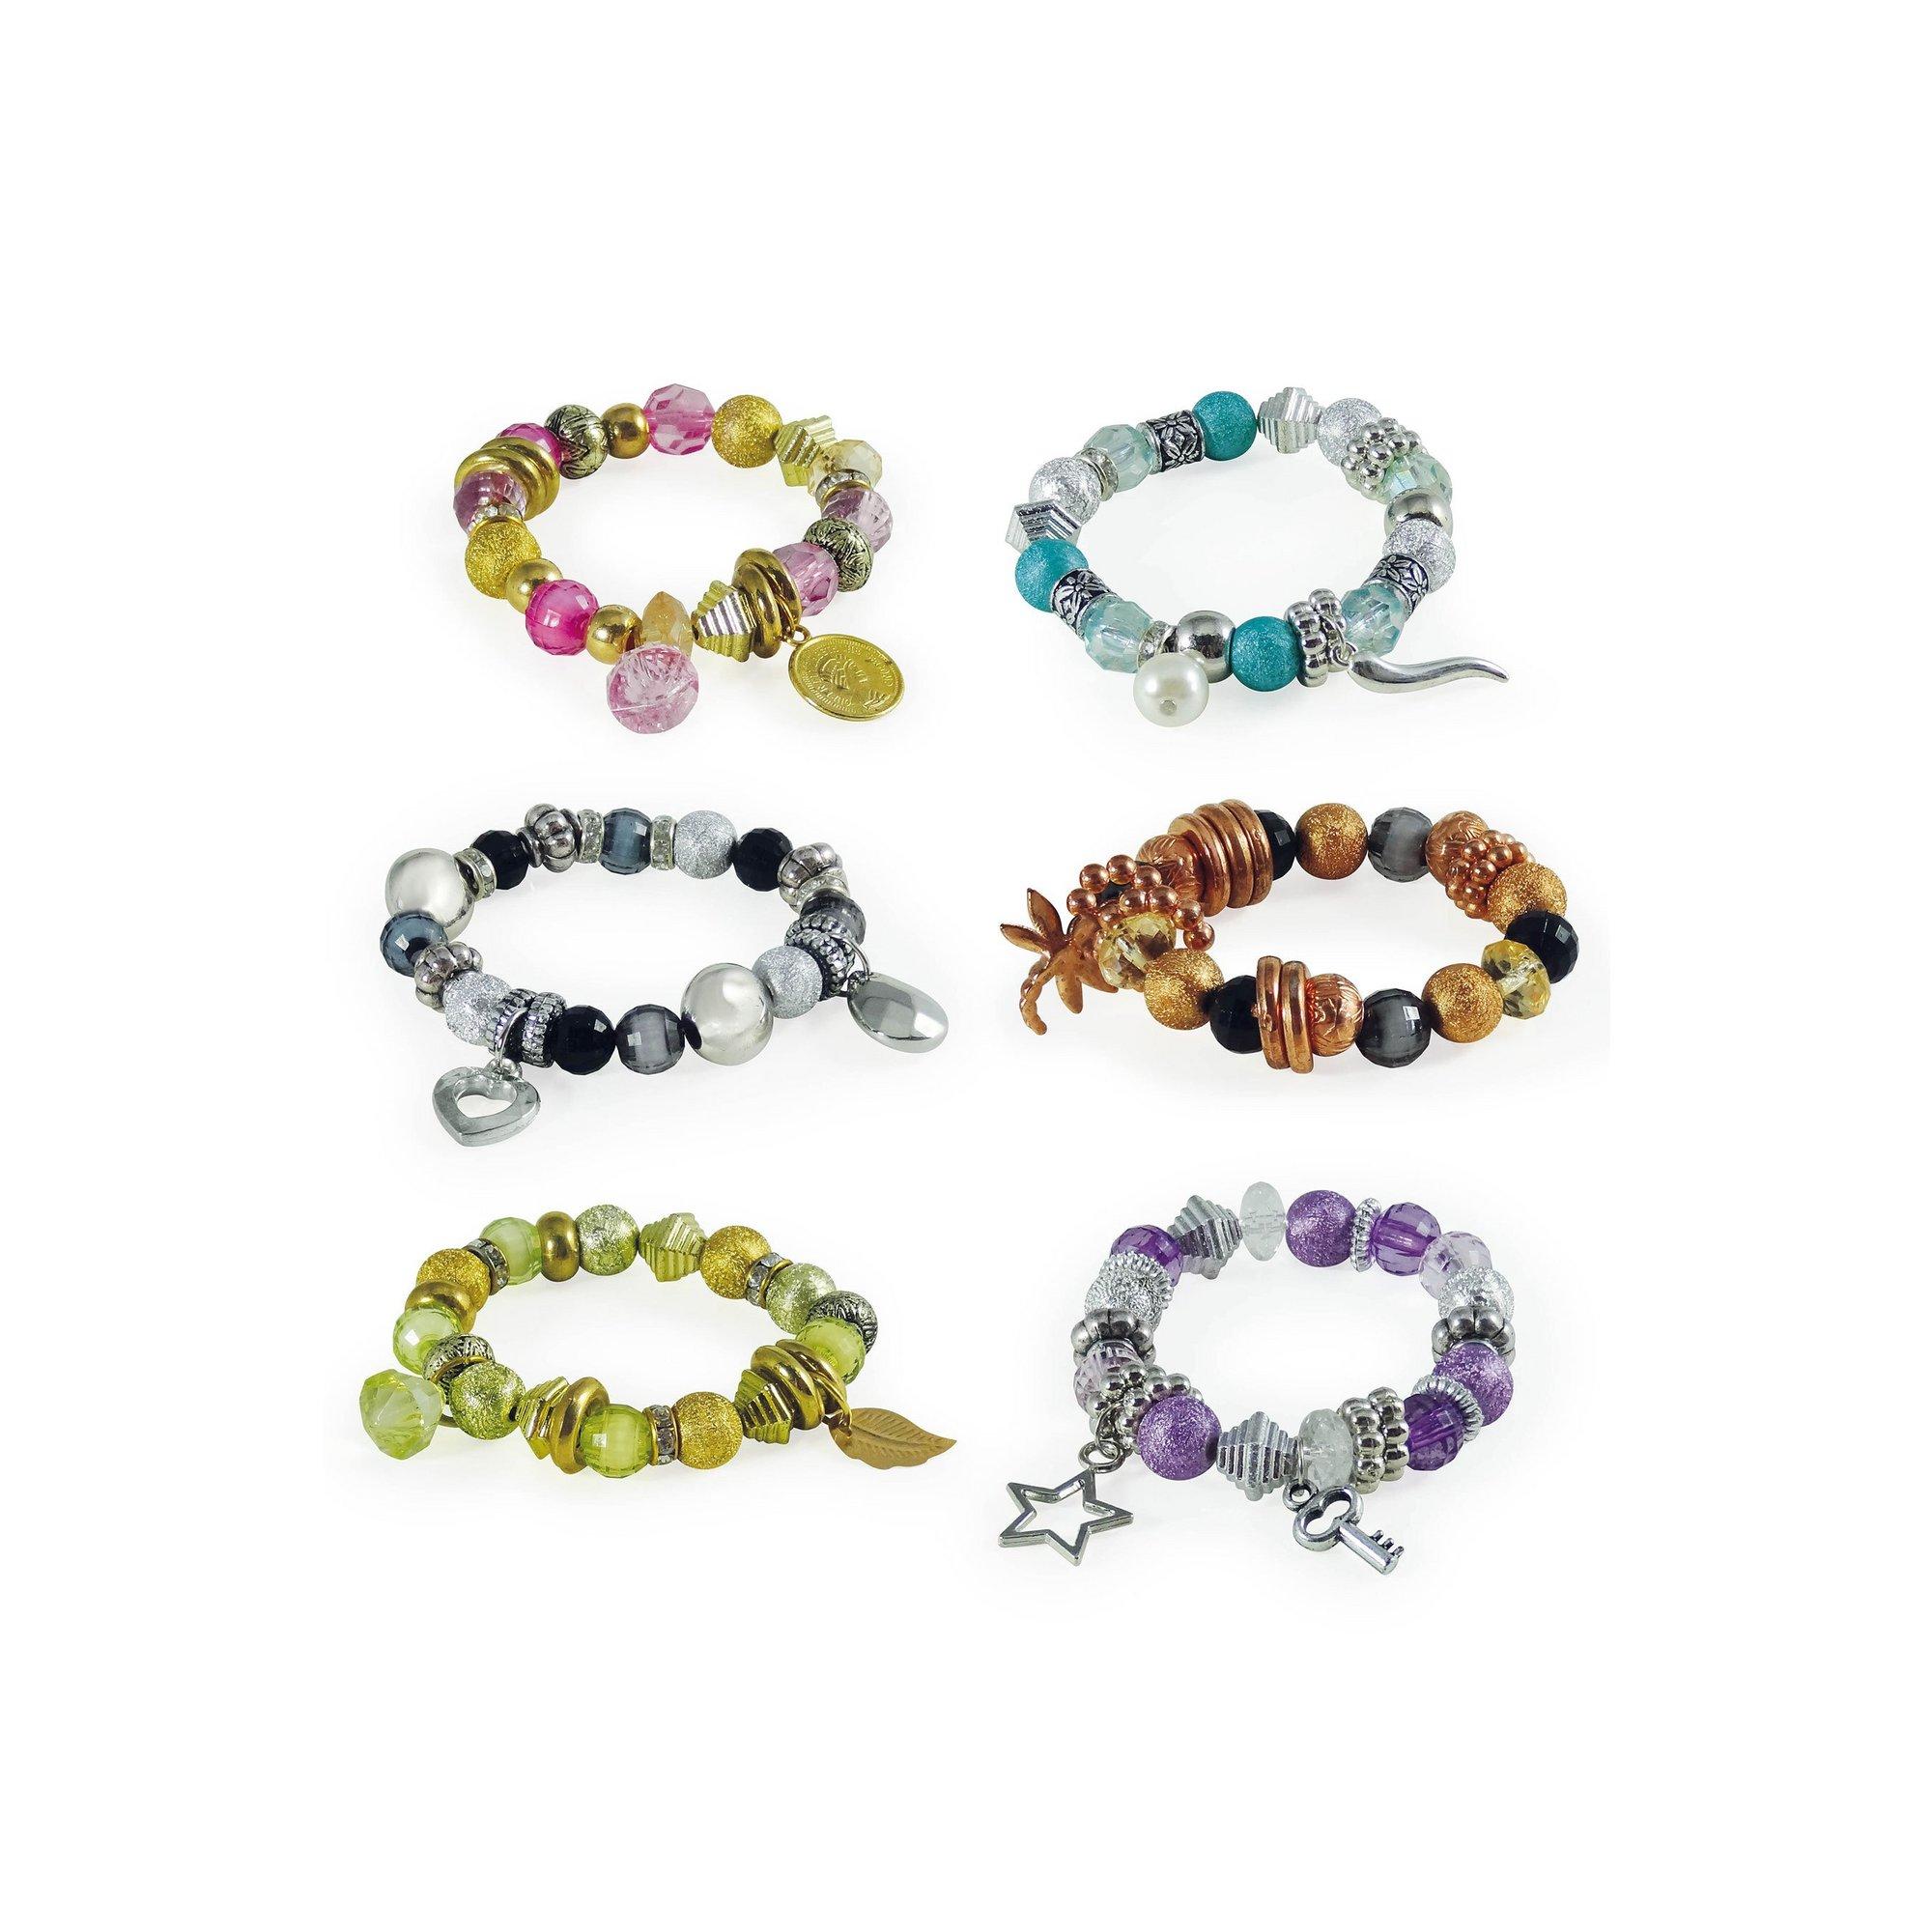 Image of Be Teens Charm Bracelets Set